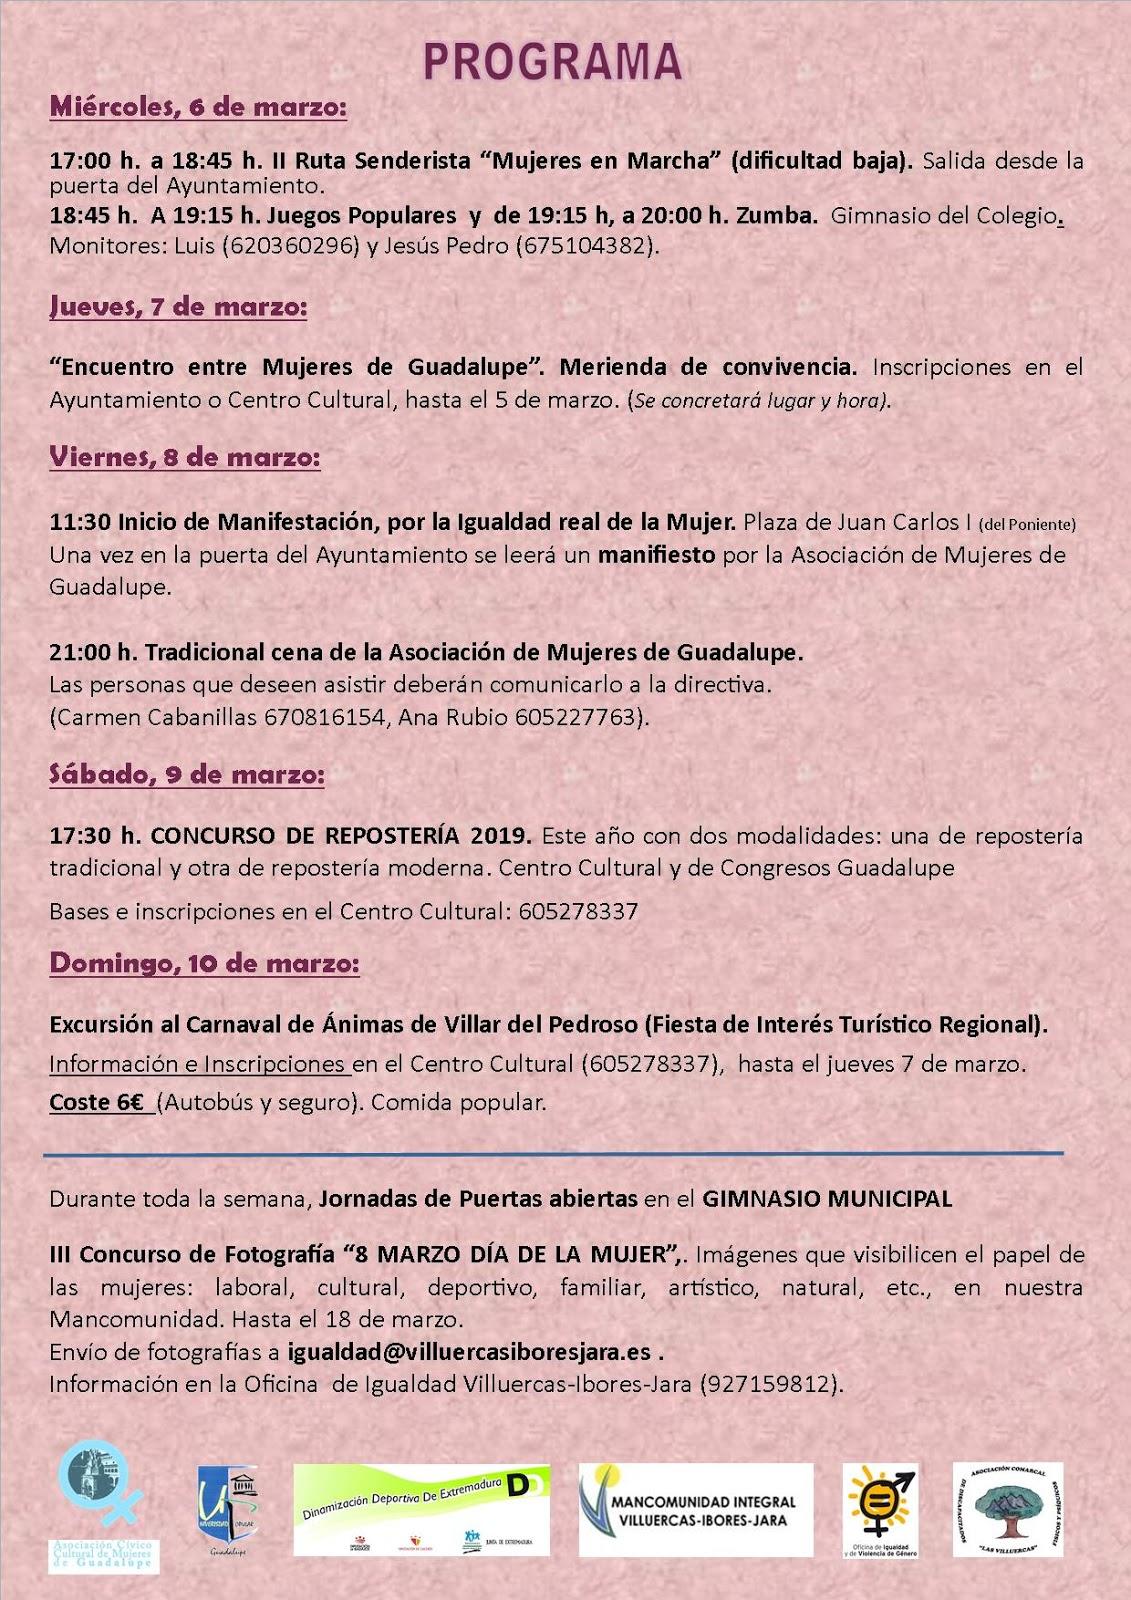 Semana de la mujer 2019 - Guadalupe (Cáceres) 2